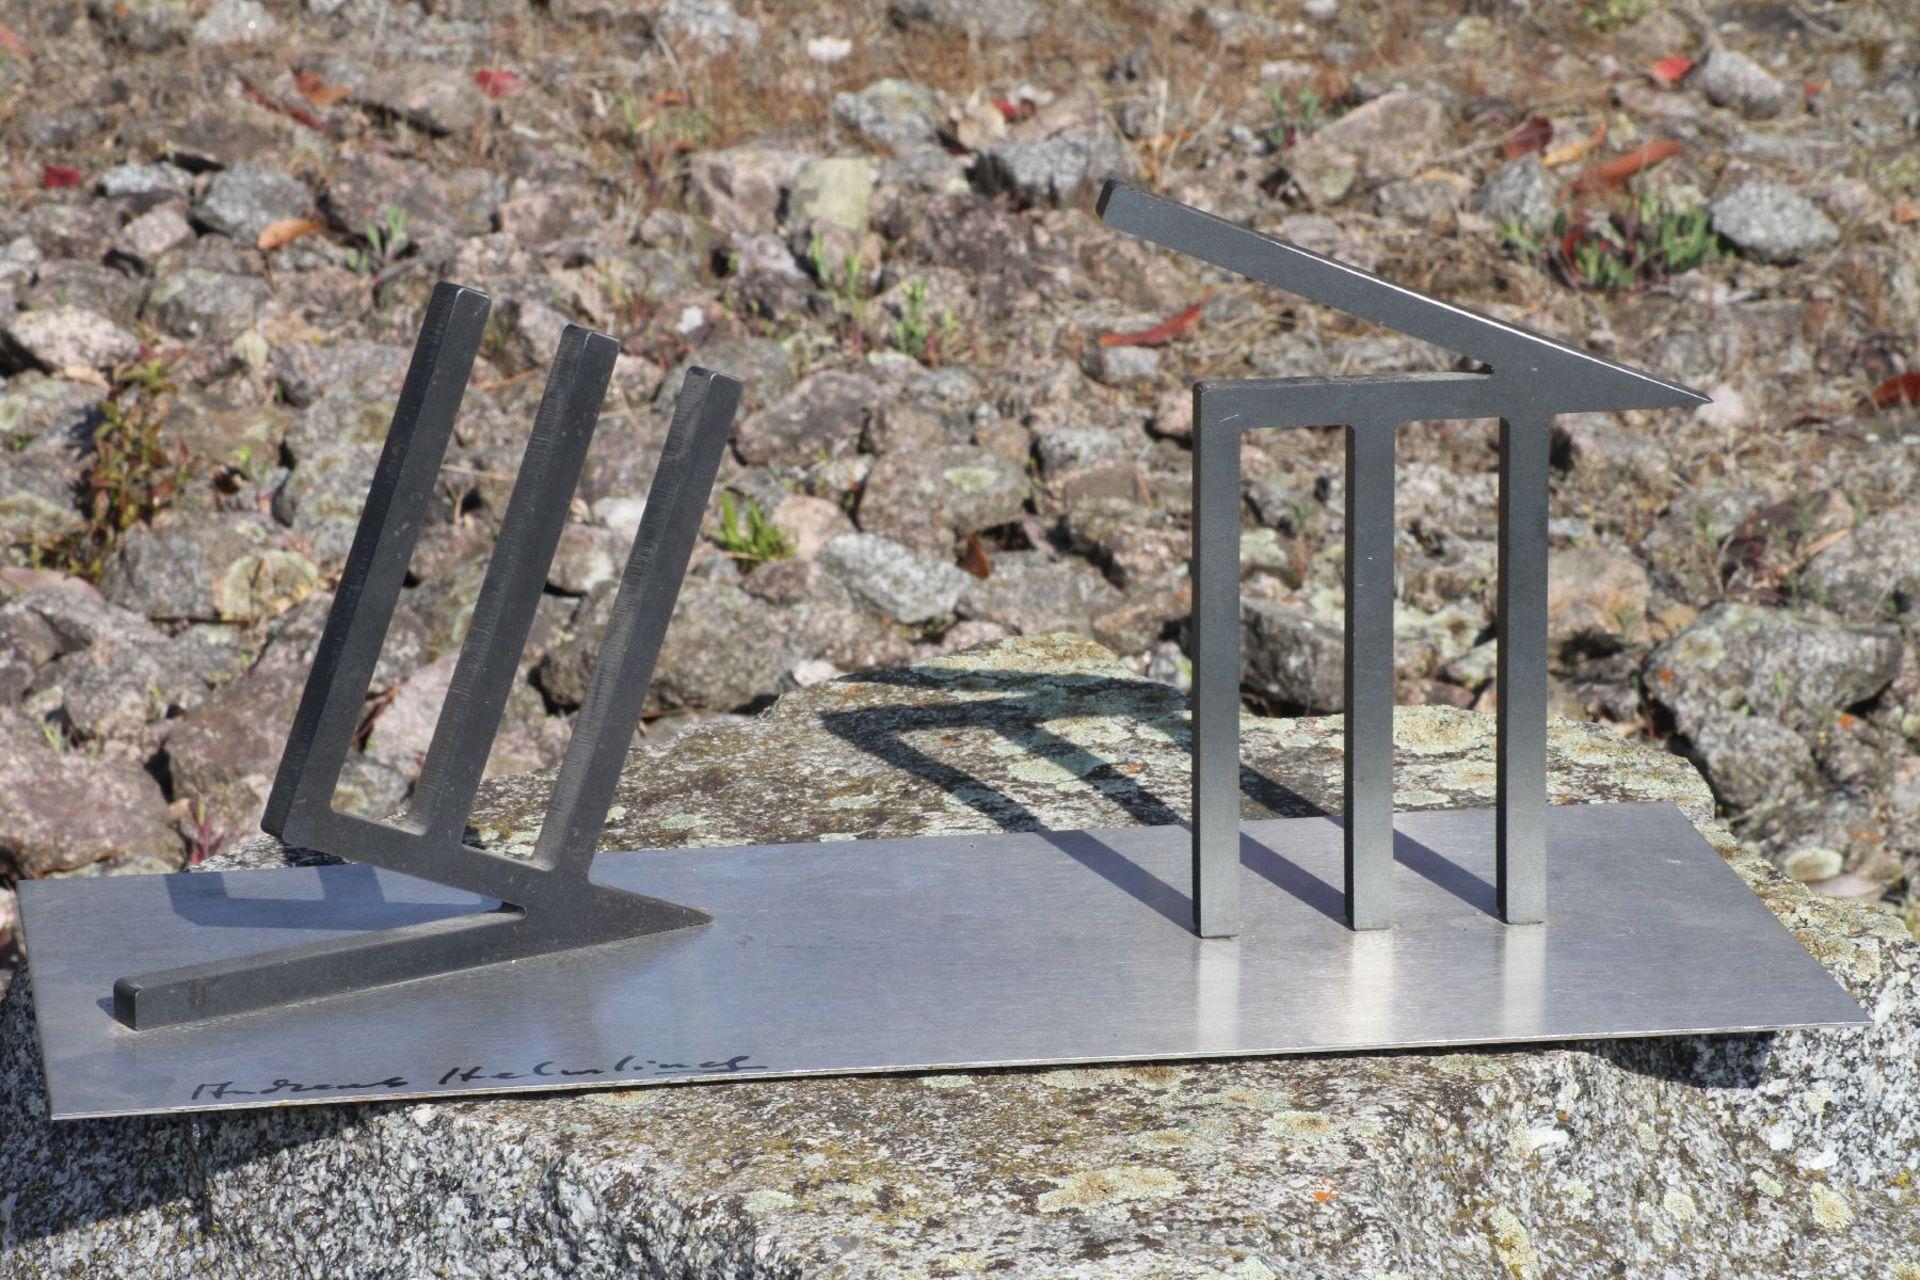 Skulptur, Andreas Helmling, Eisen/Metall, Limitierte